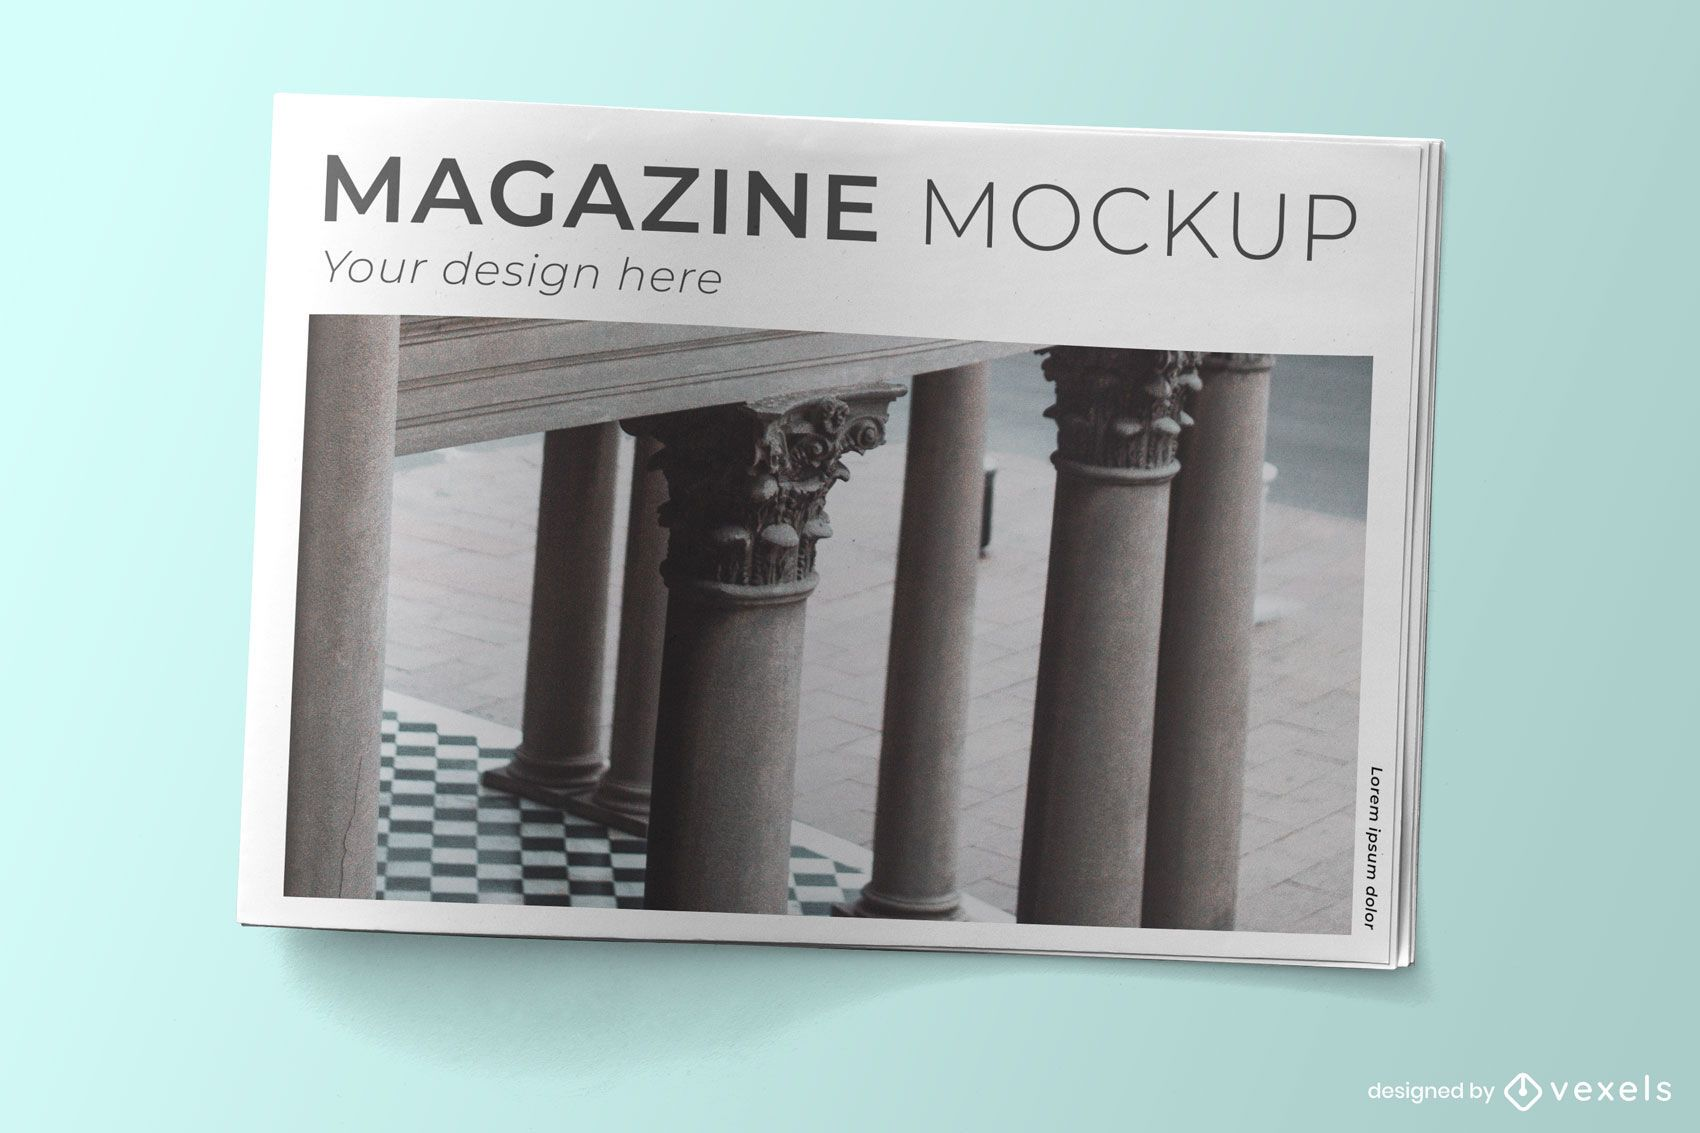 Magazin Cover Psd Mockup Design